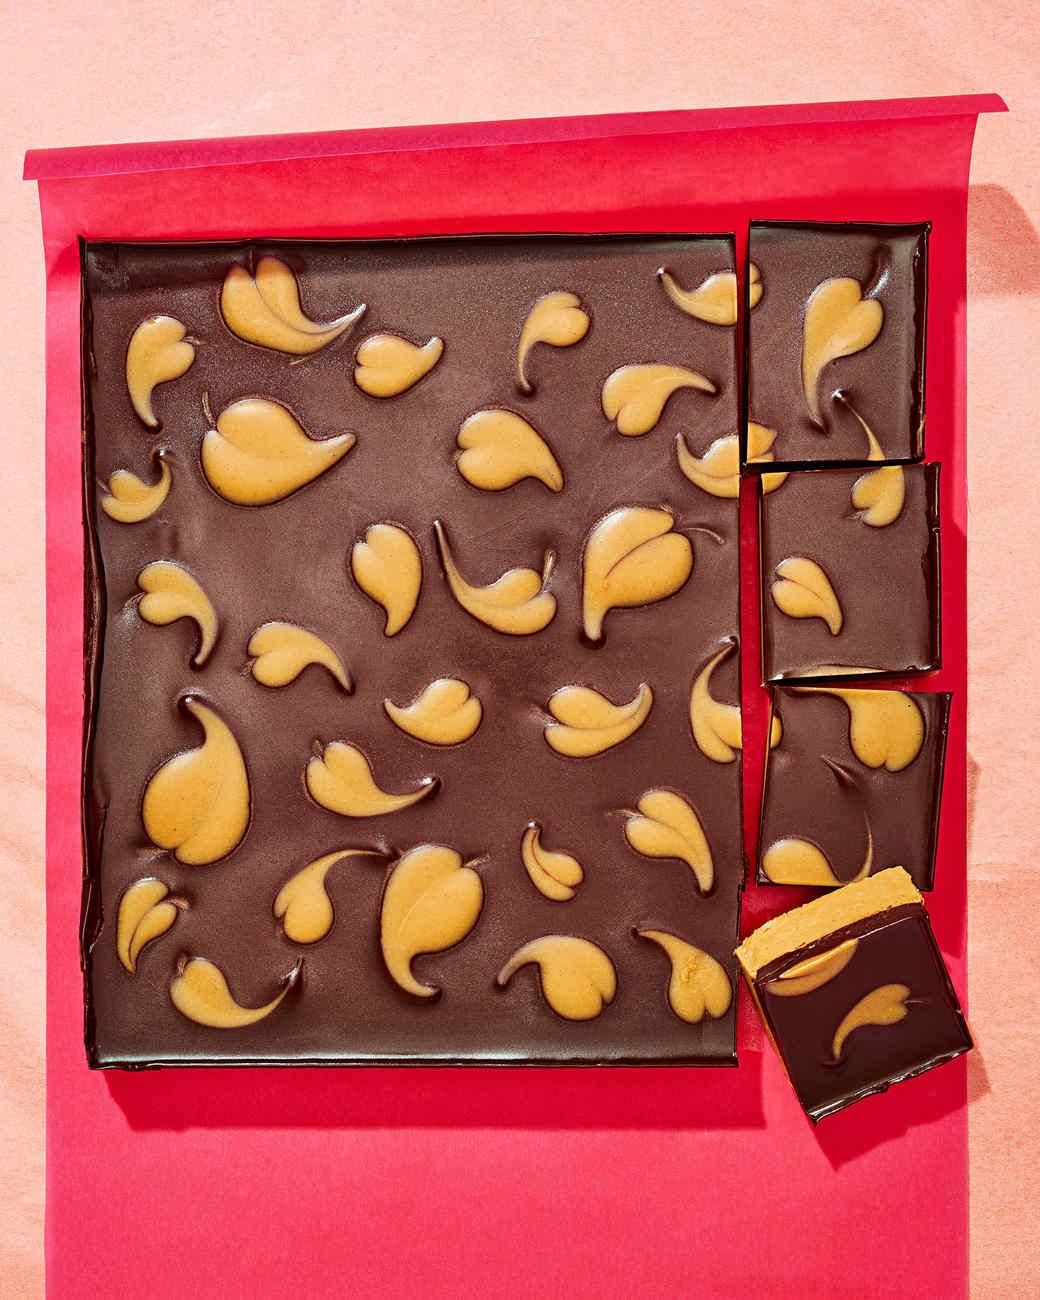 sweetie-no-bake-chocolate-peanut-butter-cup-bars-102835192.jpg